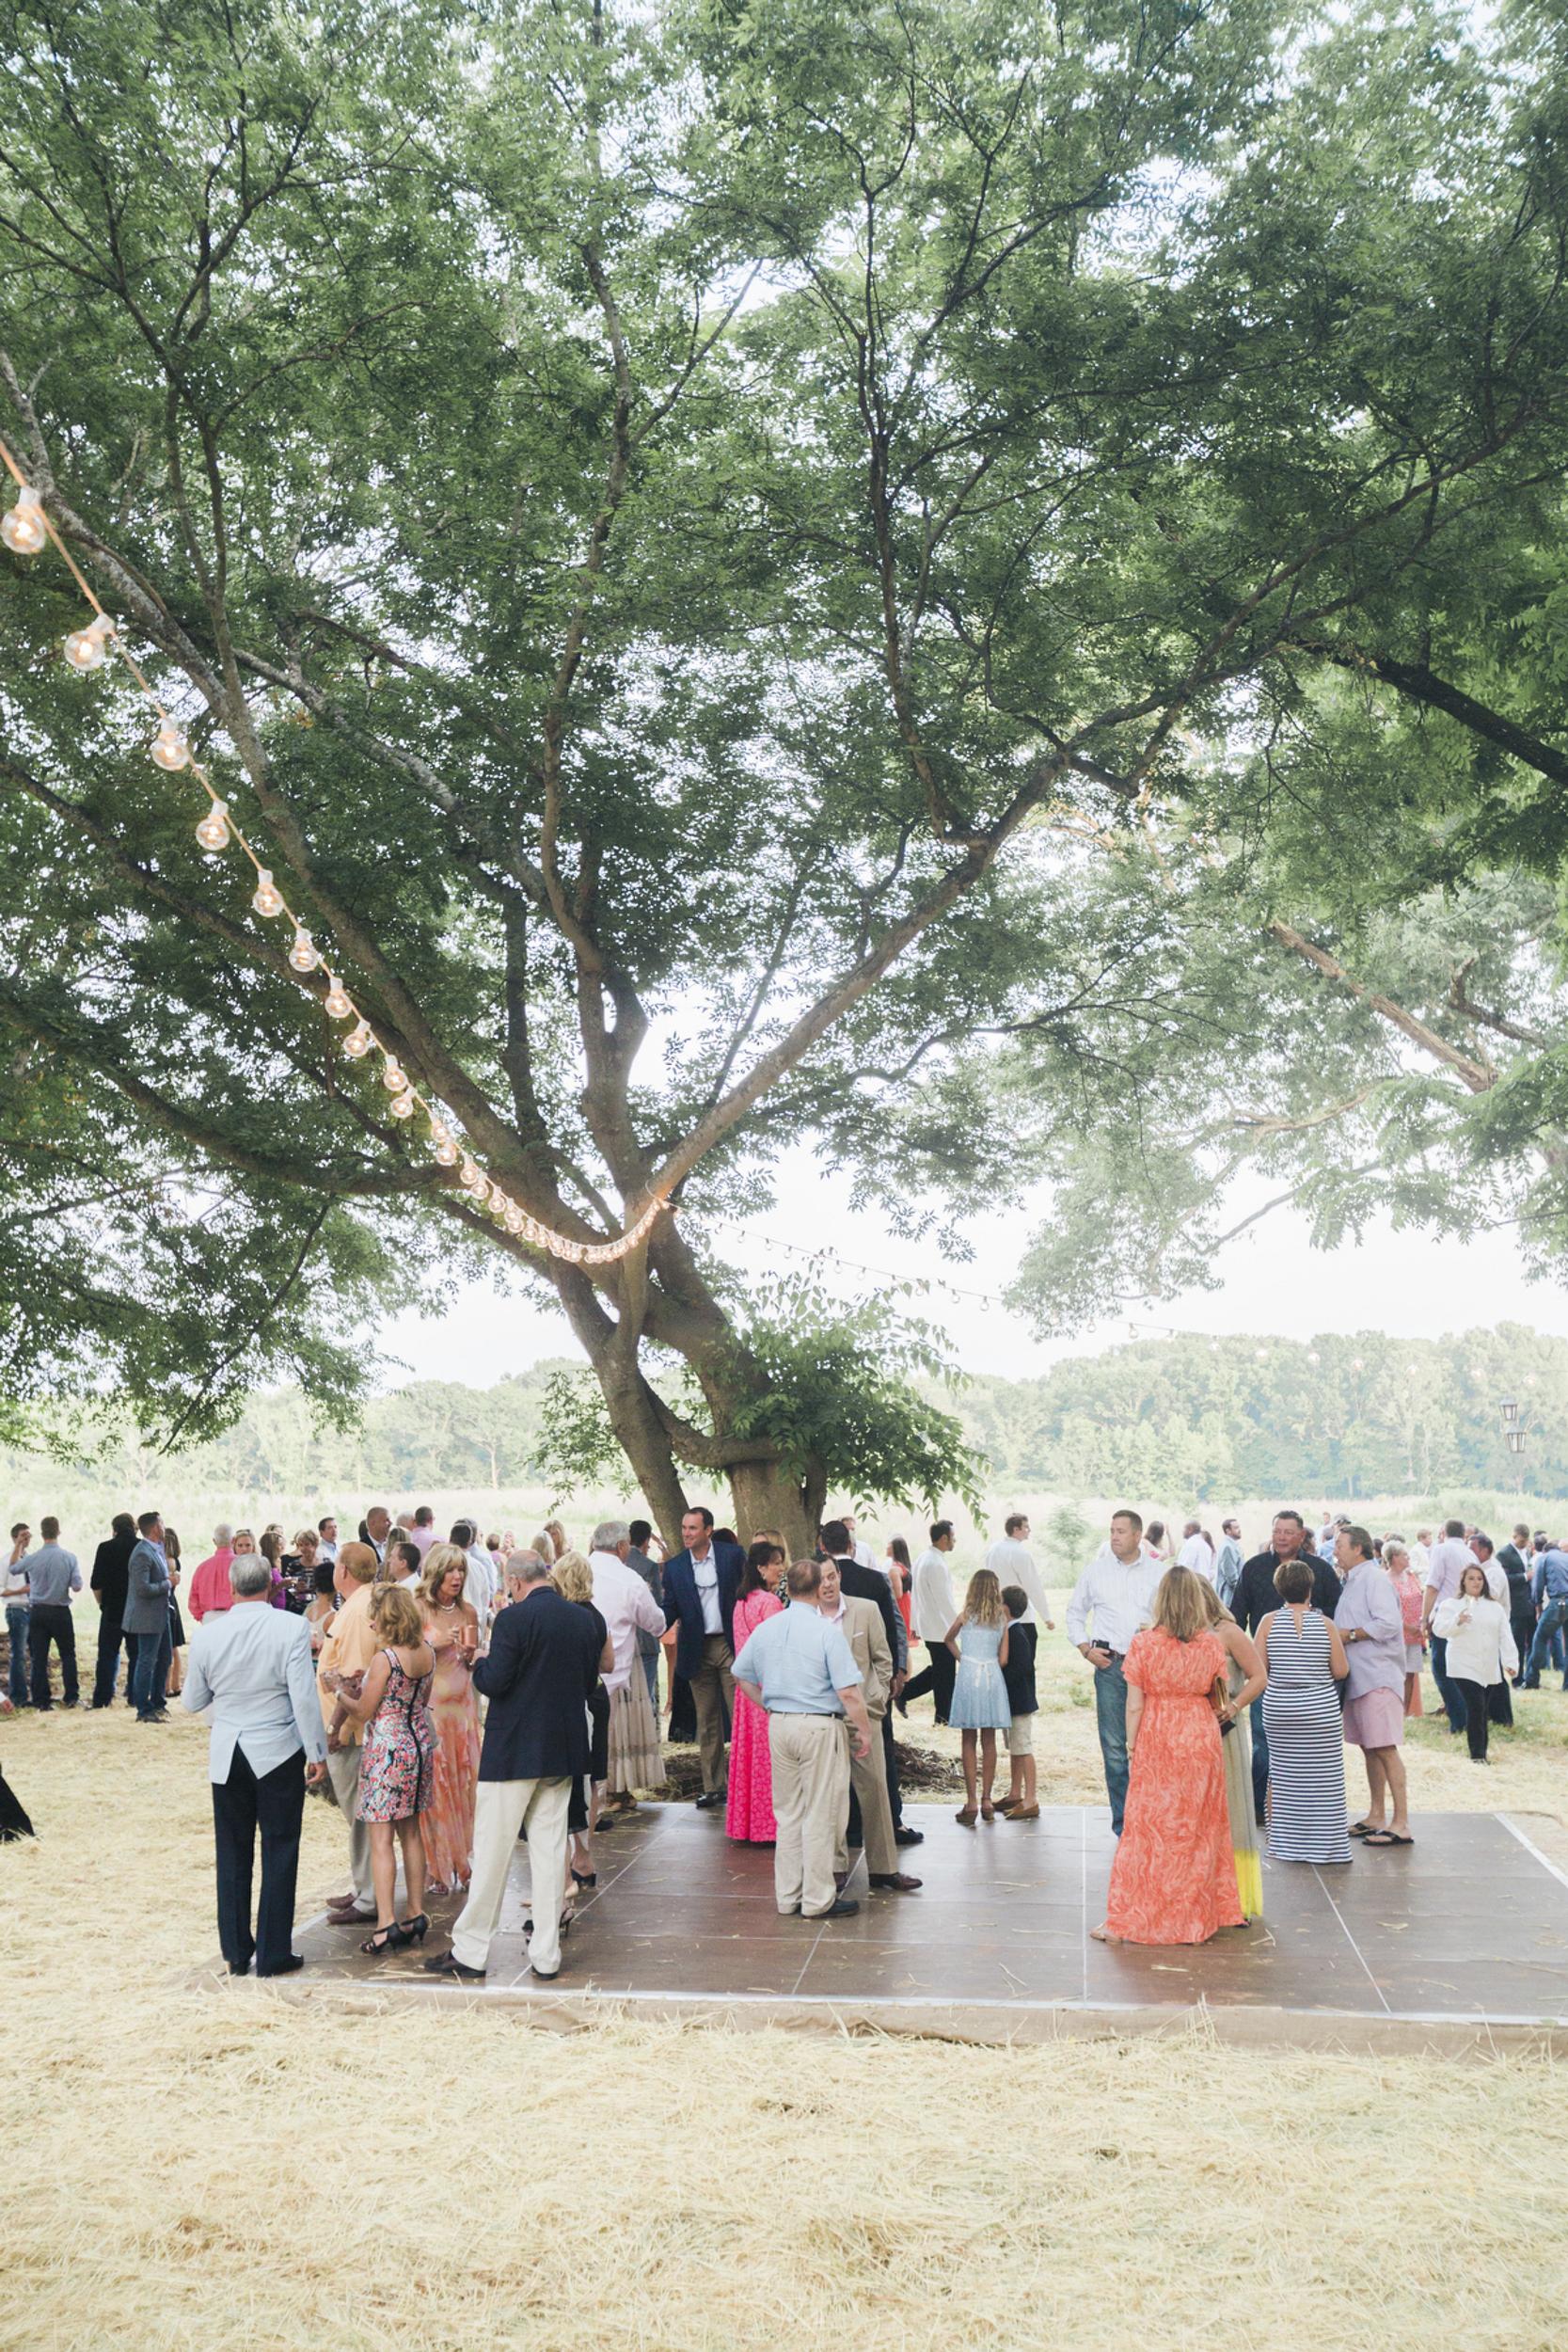 south_carolina_farm_wedding_rustic_chic_surprise_secret_luxe_wedding_bachelorette_emily_maynard_real_weddings-29.jpg